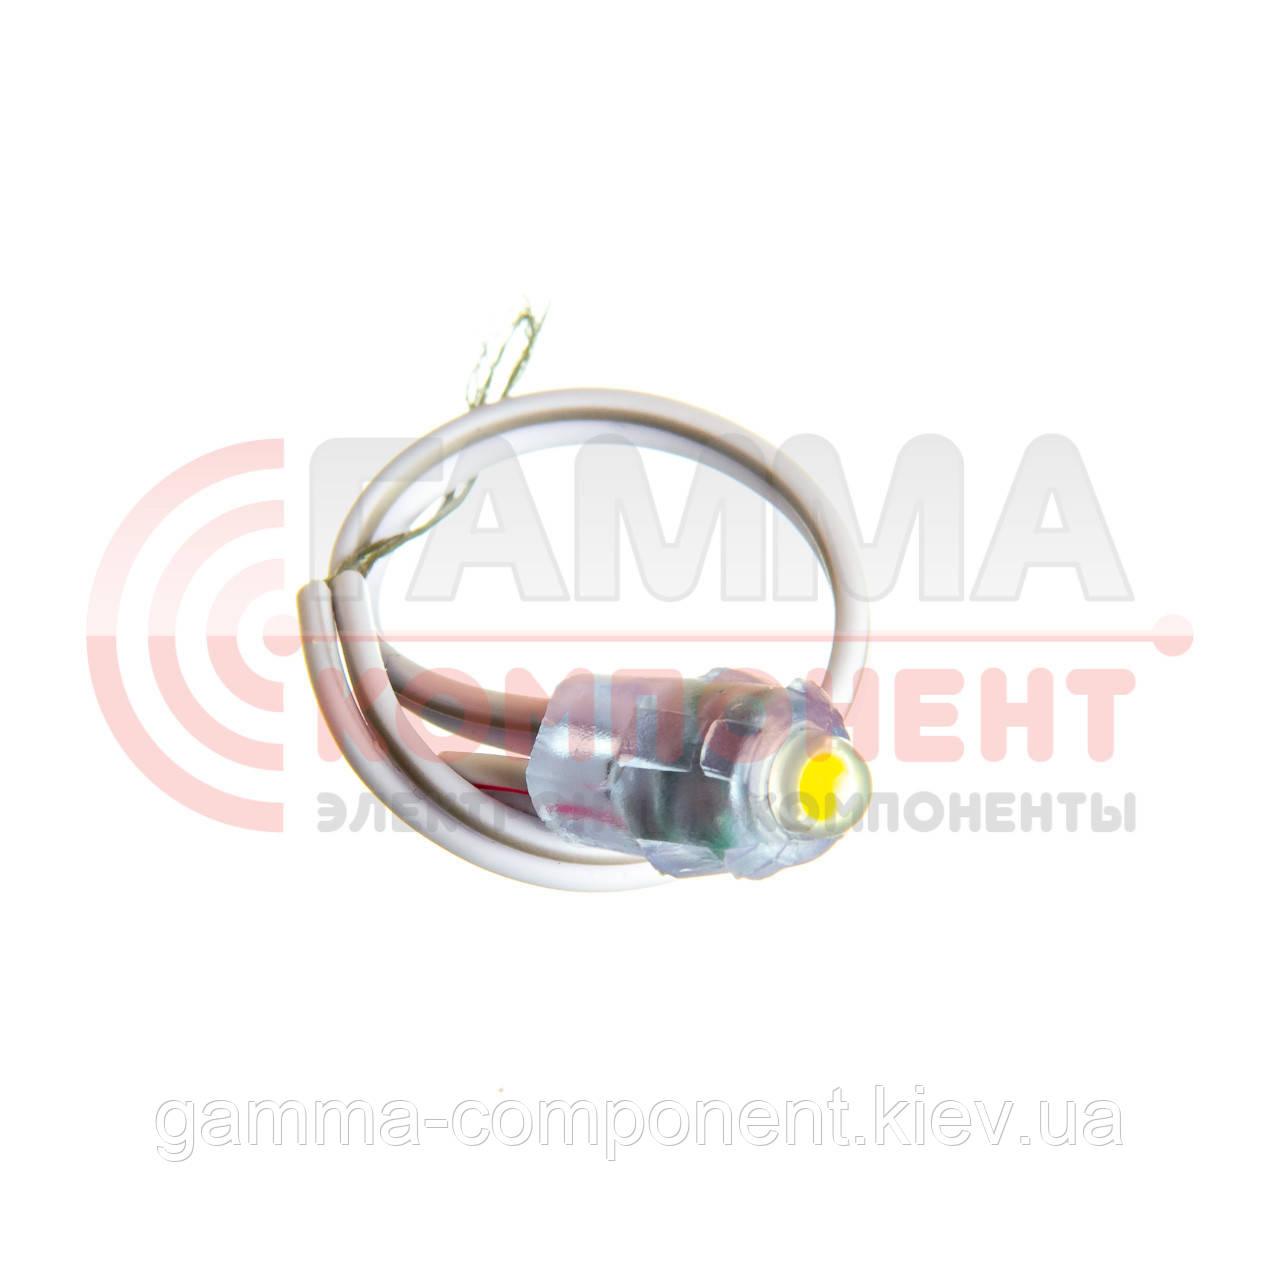 Светодиод быстрого монтажа 1led, 0,08W, белый, 12V, IP65